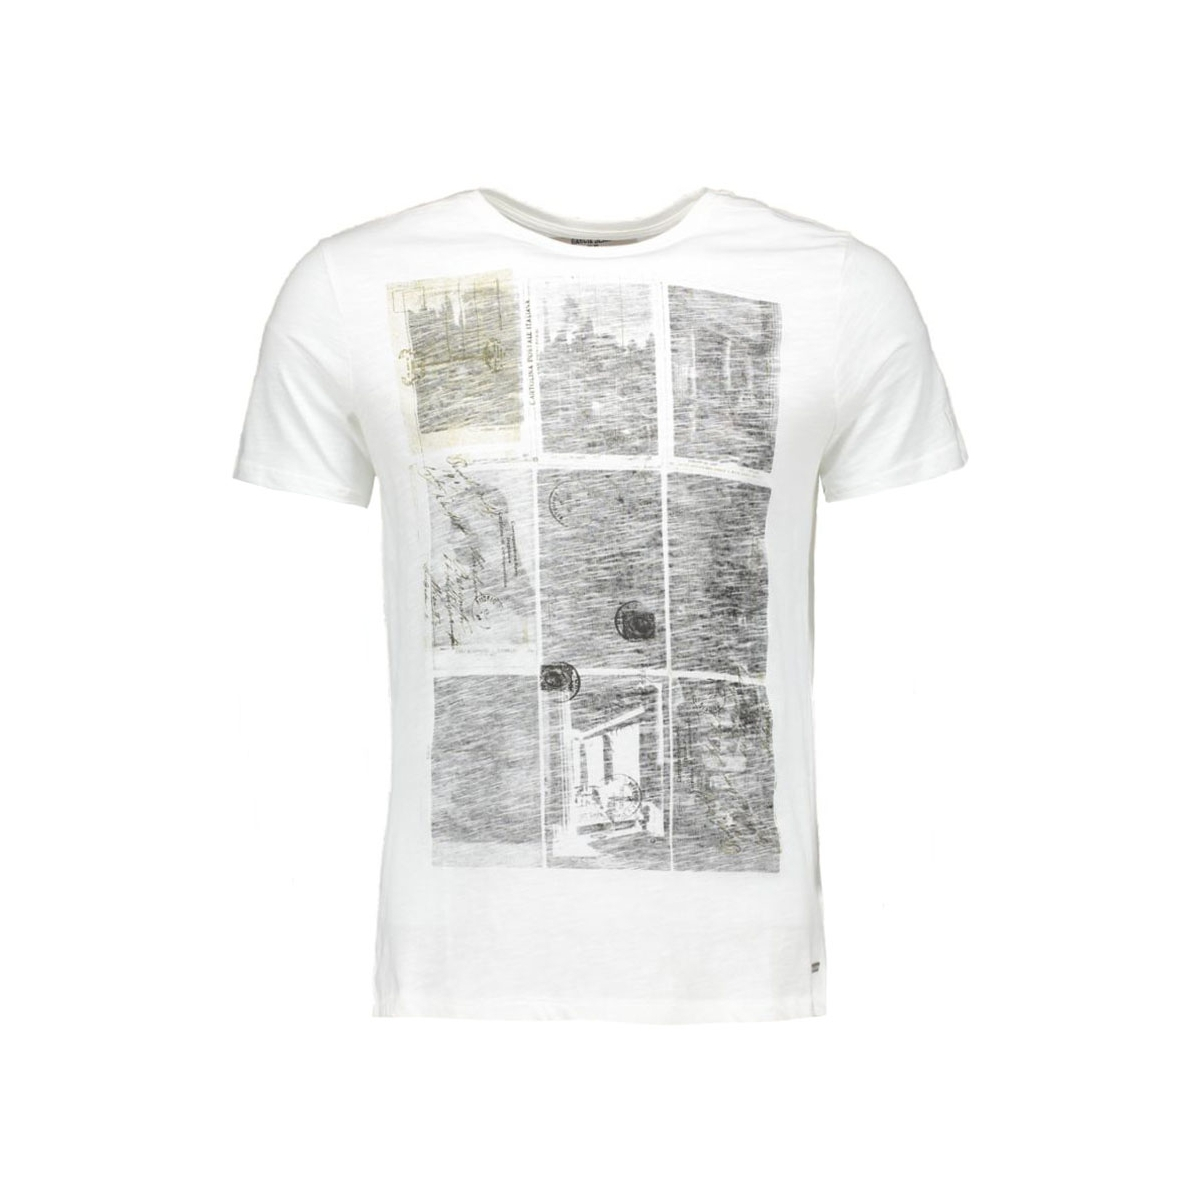 t61202 garcia t-shirt 1980 froth